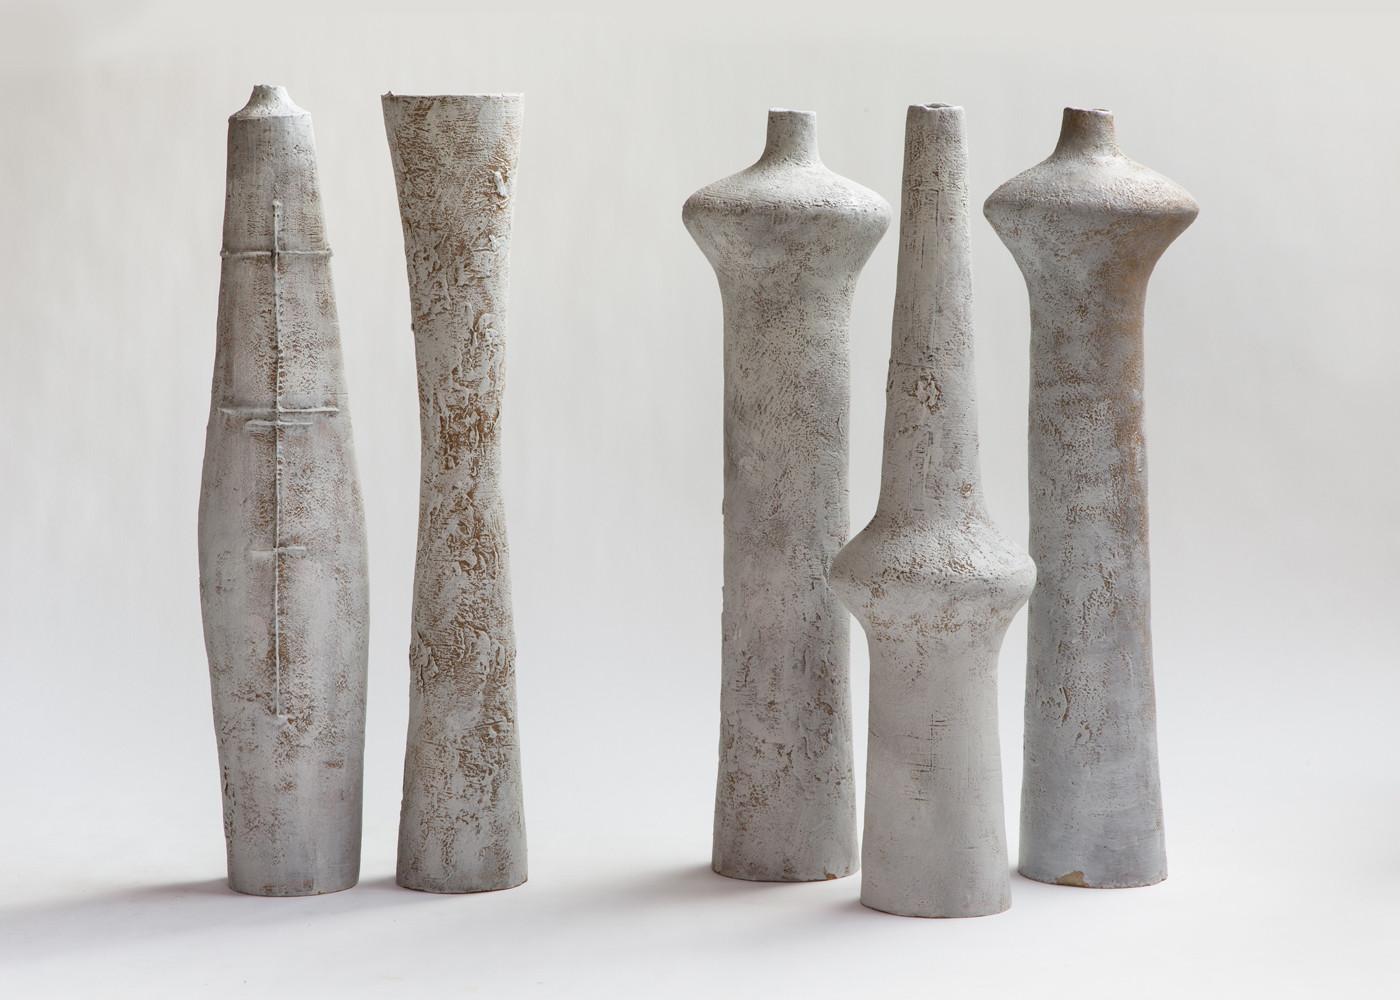 Vessel Group, 2012, stoneware